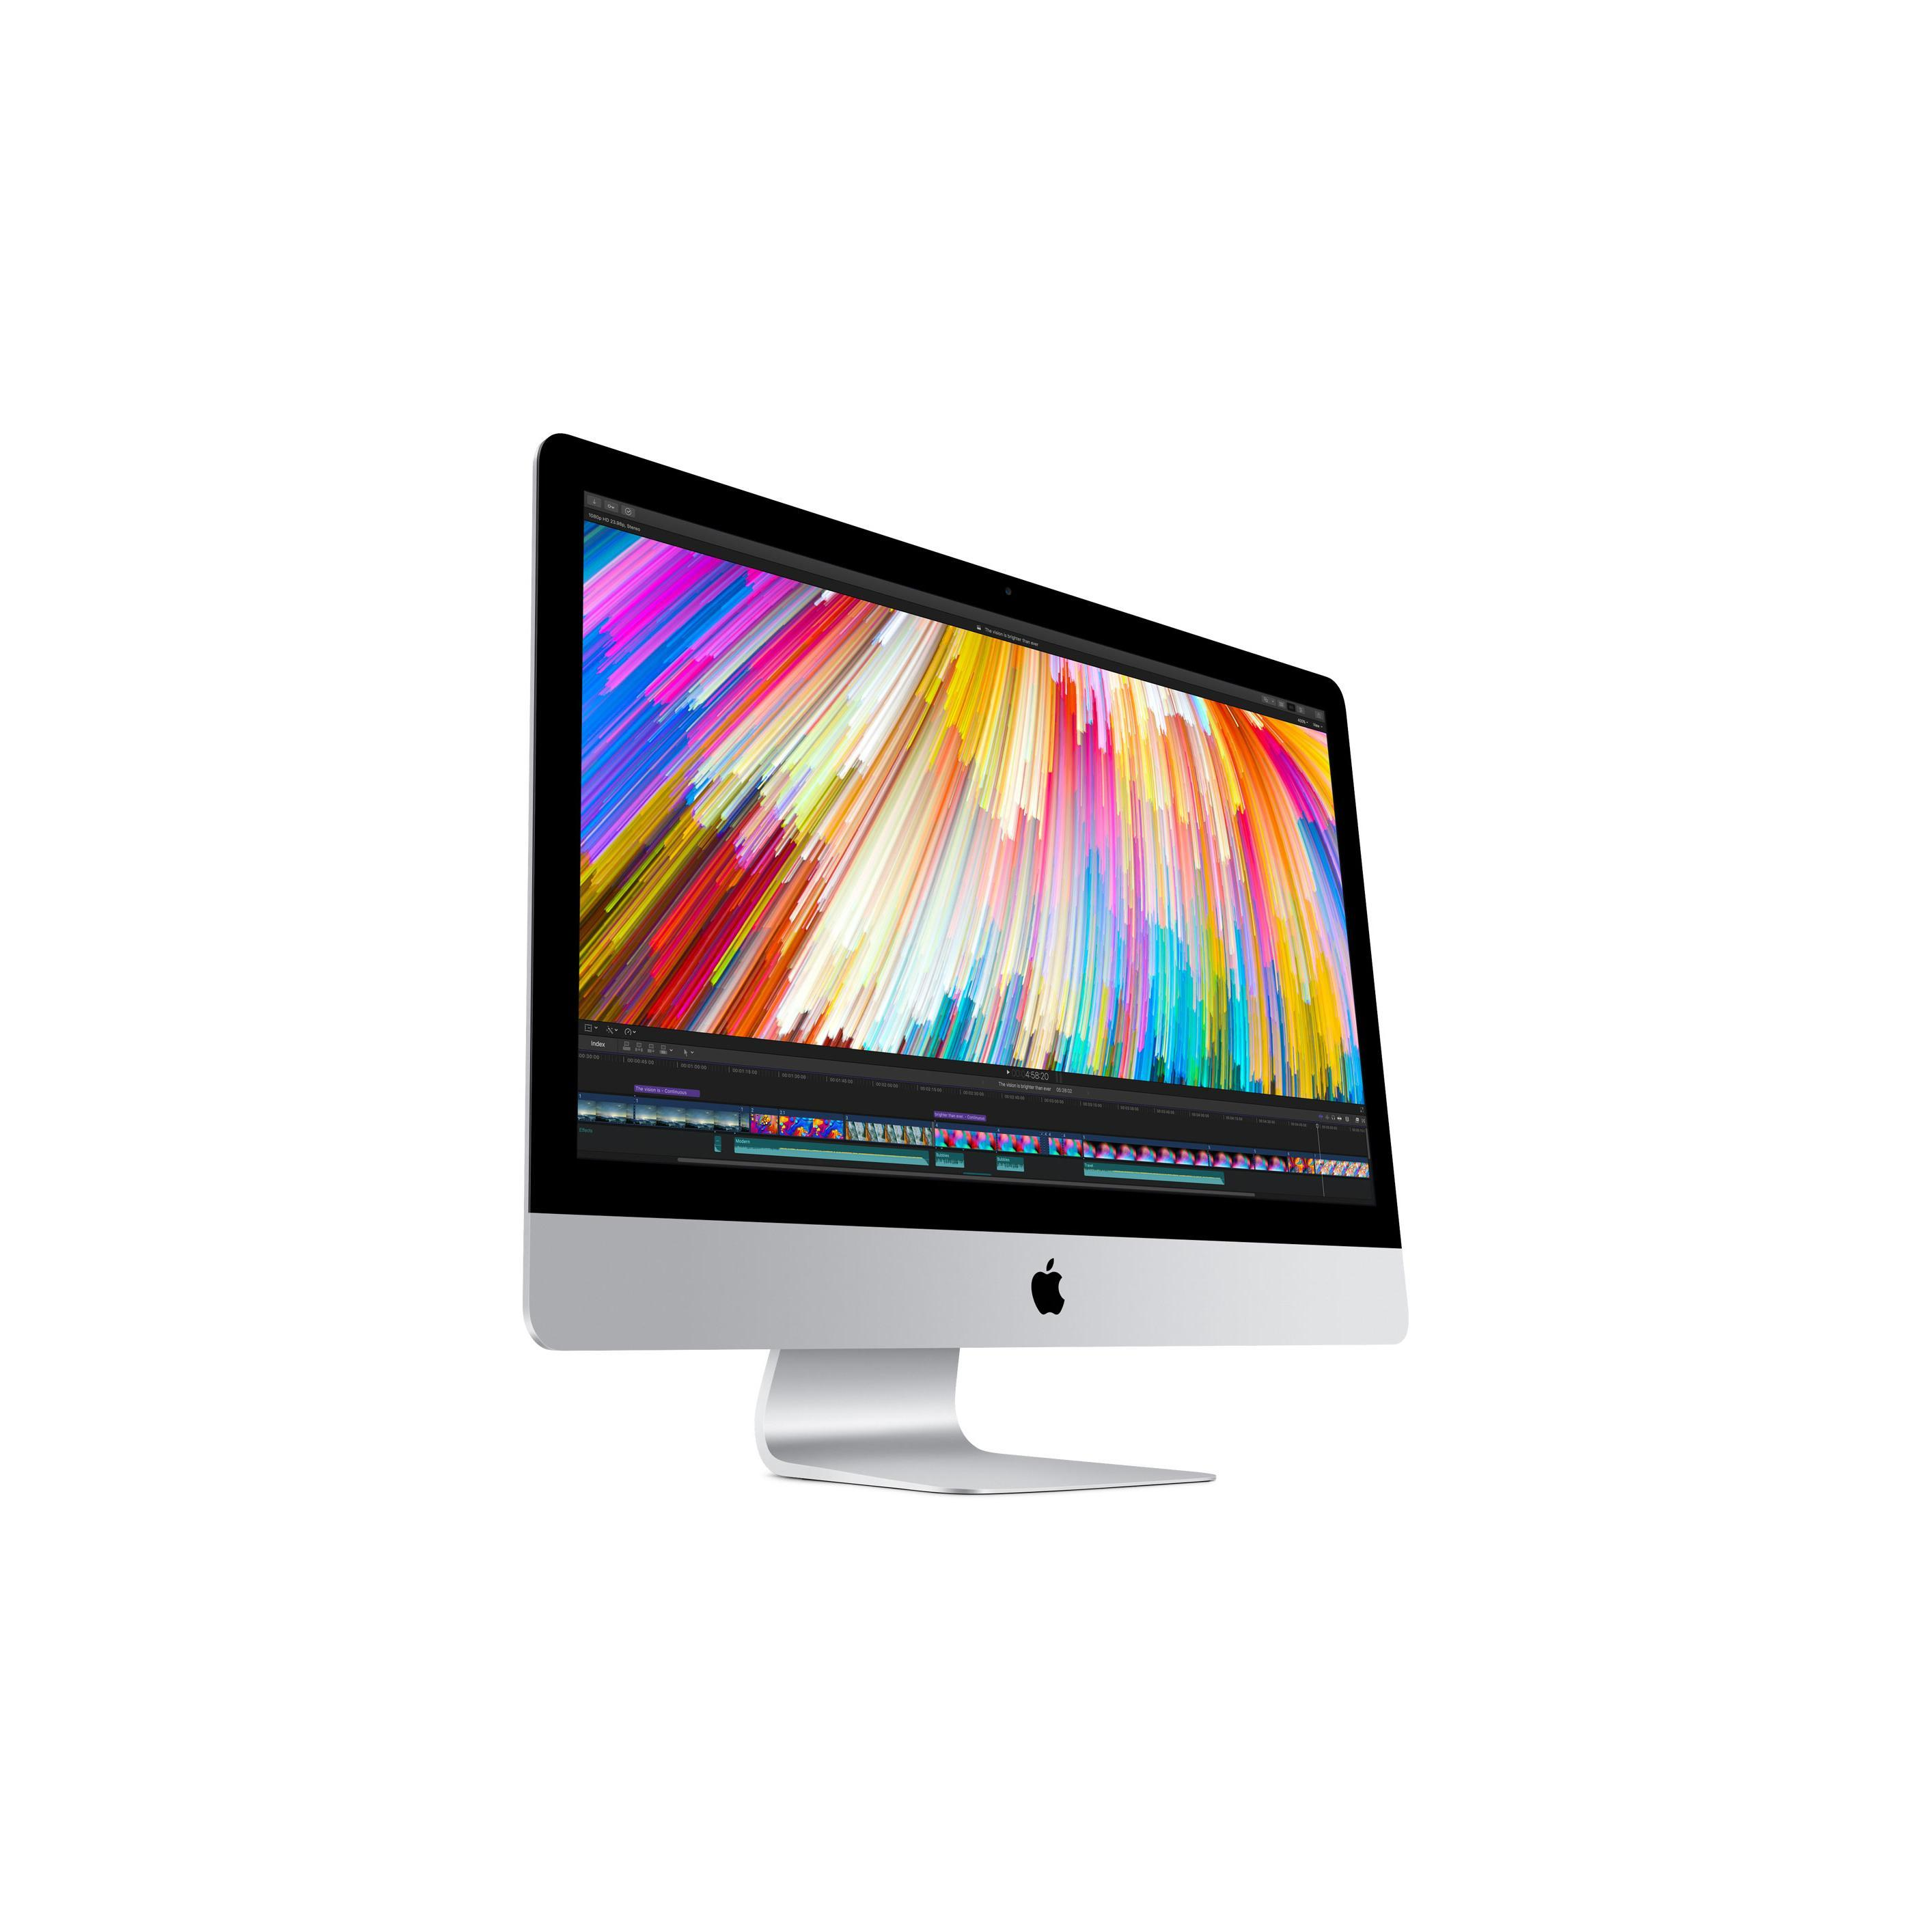 iMac 27-inch Retina (Late 2015) Core i5 3.2GHz - HDD 1 TB - 16GB AZERTY - French